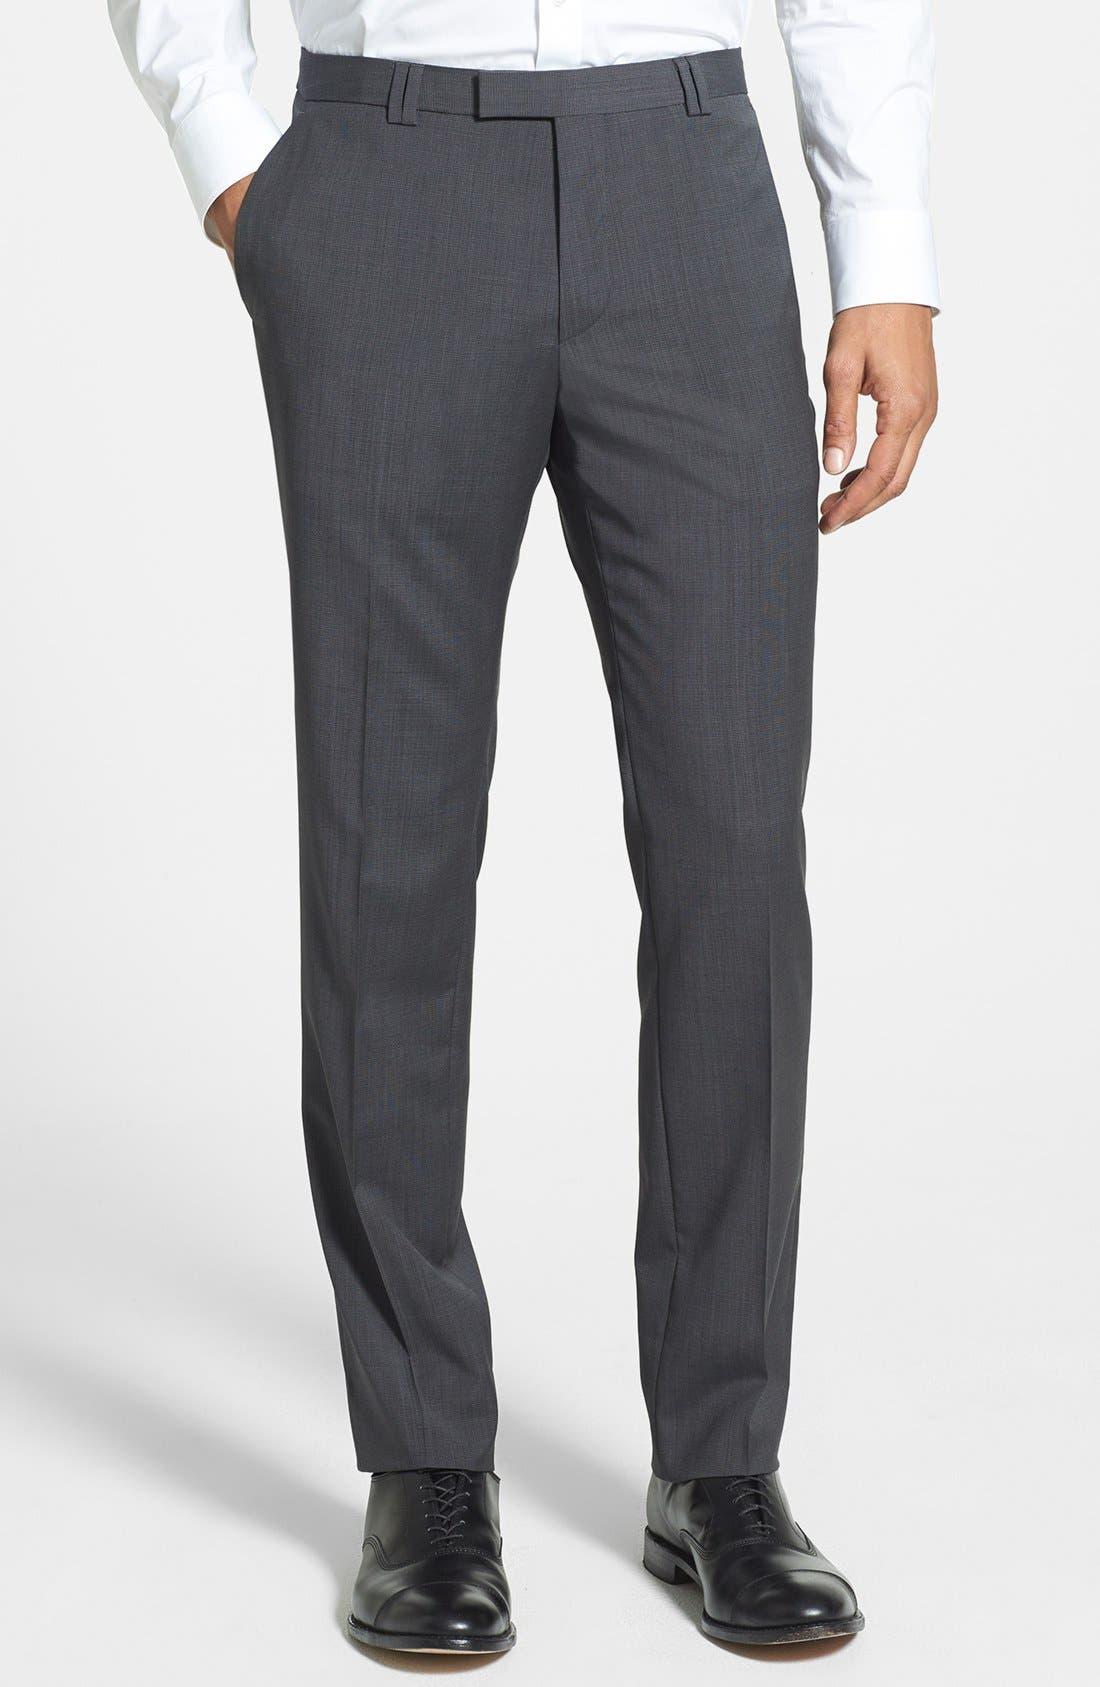 Alternate Image 1 Selected - HUGO 'Heibo' Flat Front Wool Trousers